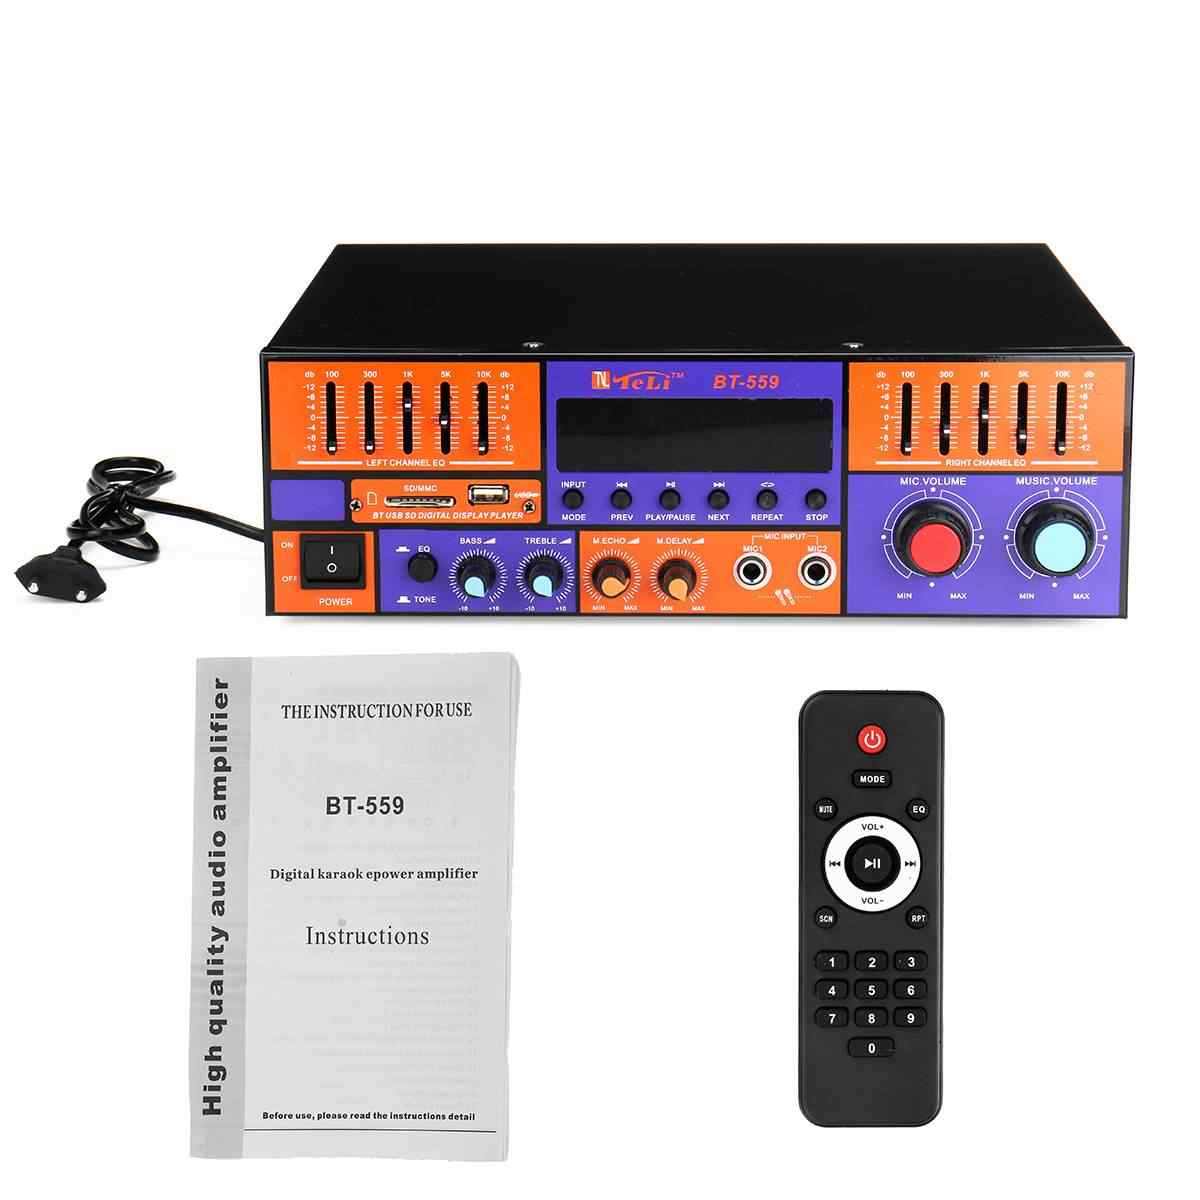 KROAK 3000W Audio Power Amplifier bluetooth Car Digital Stereo Amplifier  HIFI USB FM with Remote Control 2 Channels Amplifiers Stereo Amplifiers